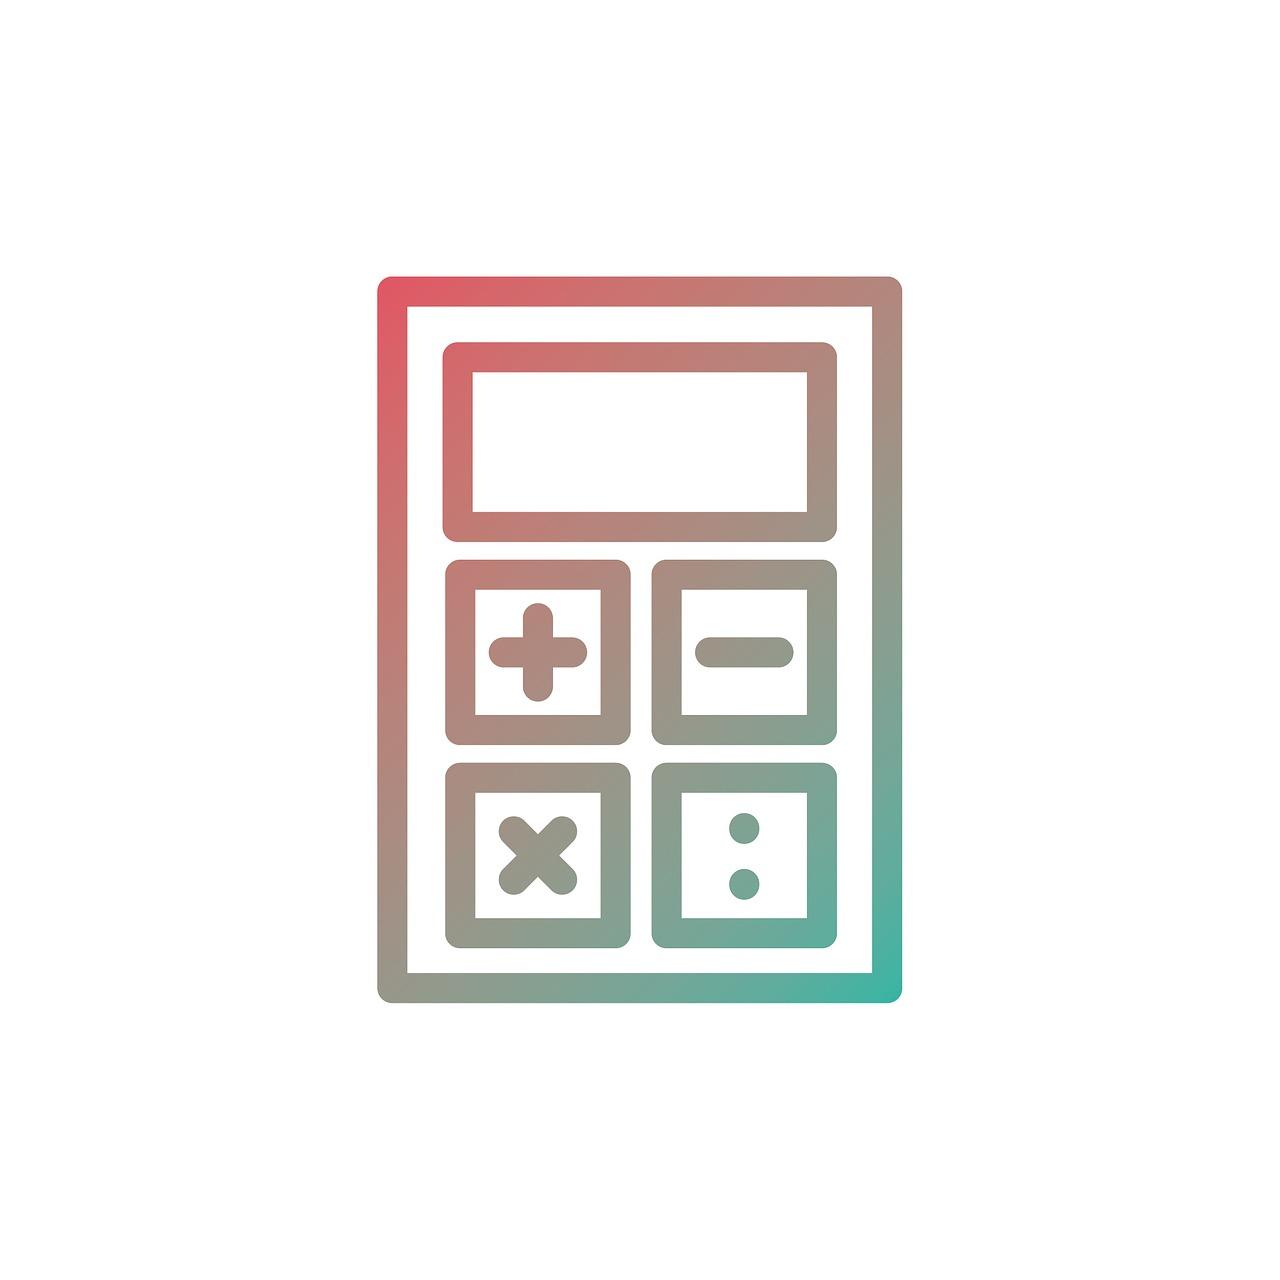 Calculator Icon Business Finance Symbol Design Sign Set